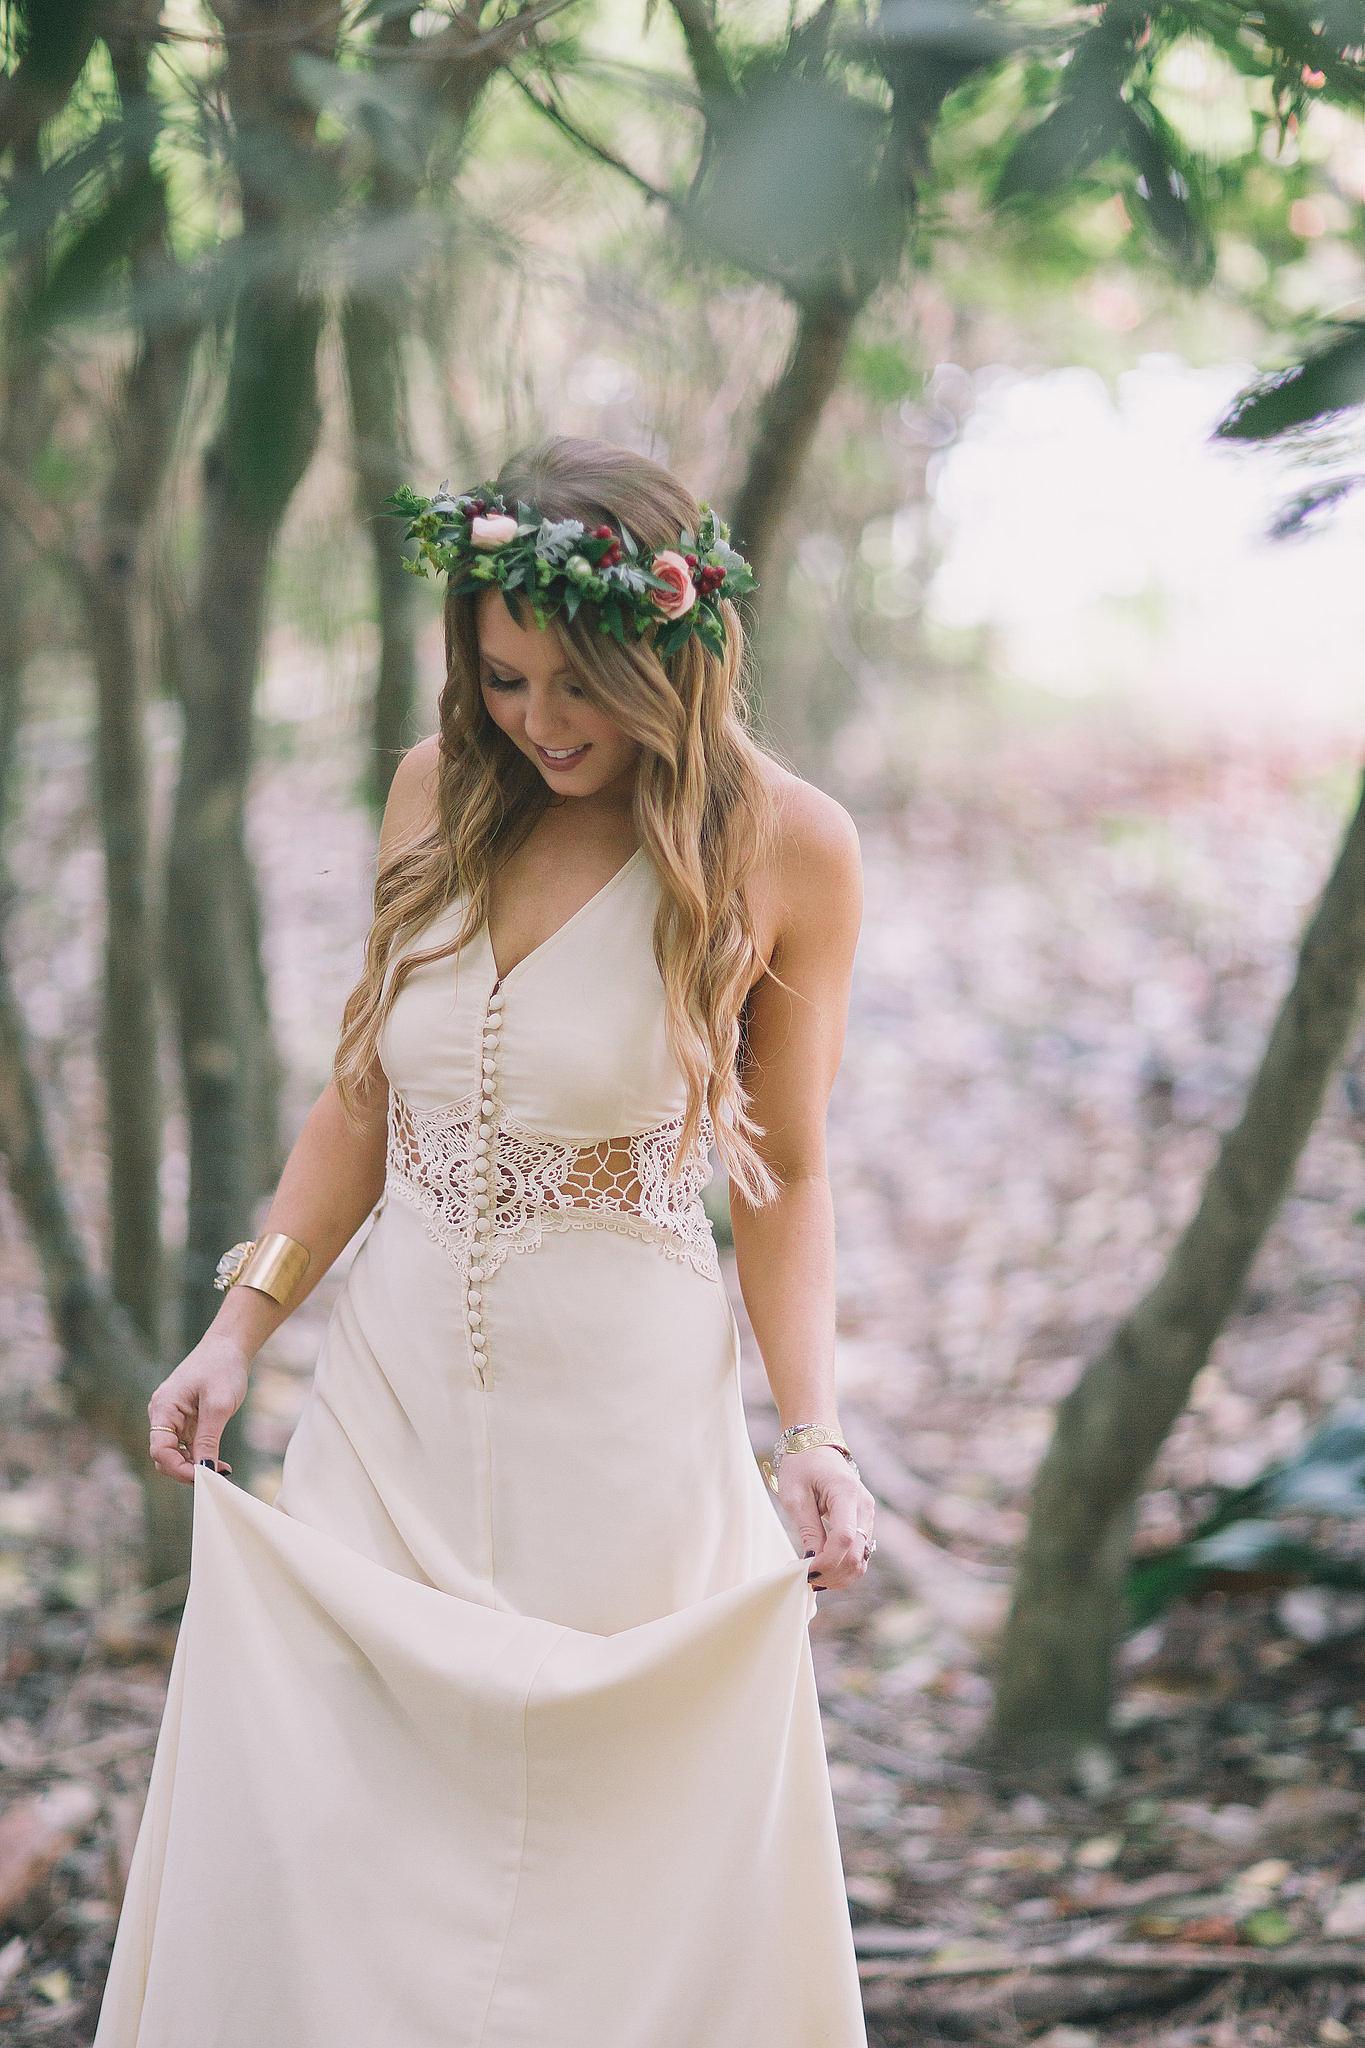 Get the Indie Dress